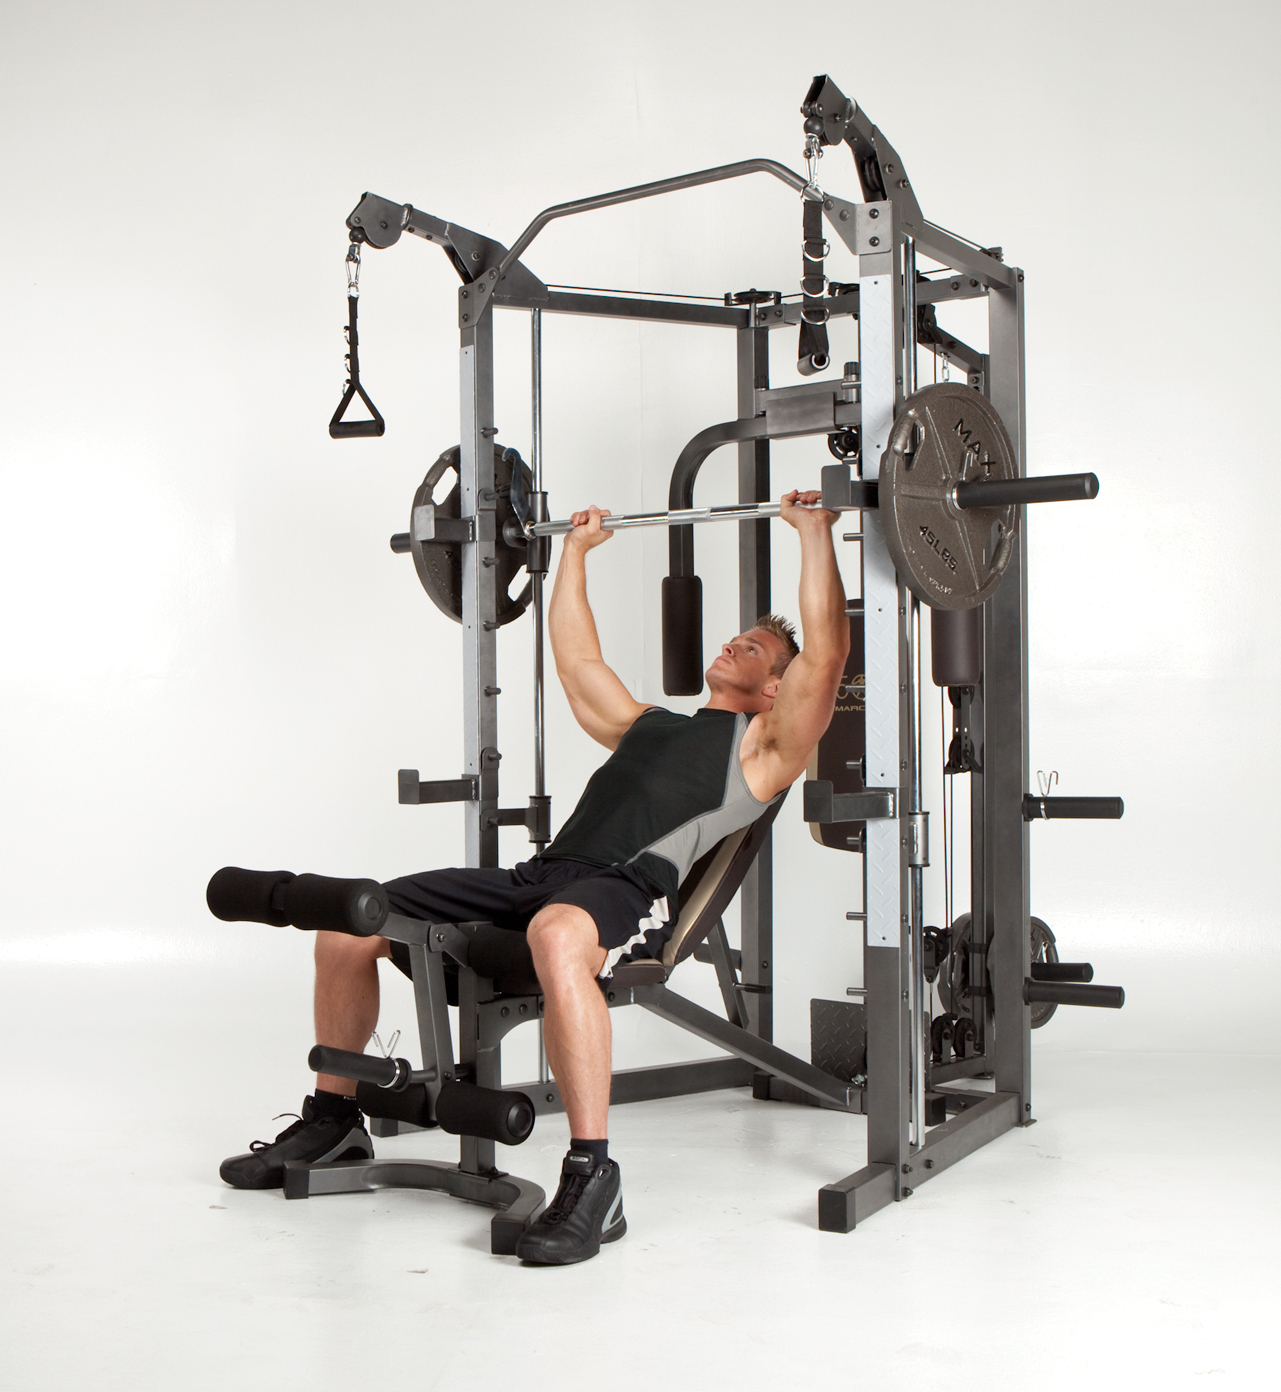 Marcy Combo Smith Machine - Fitness & Sports